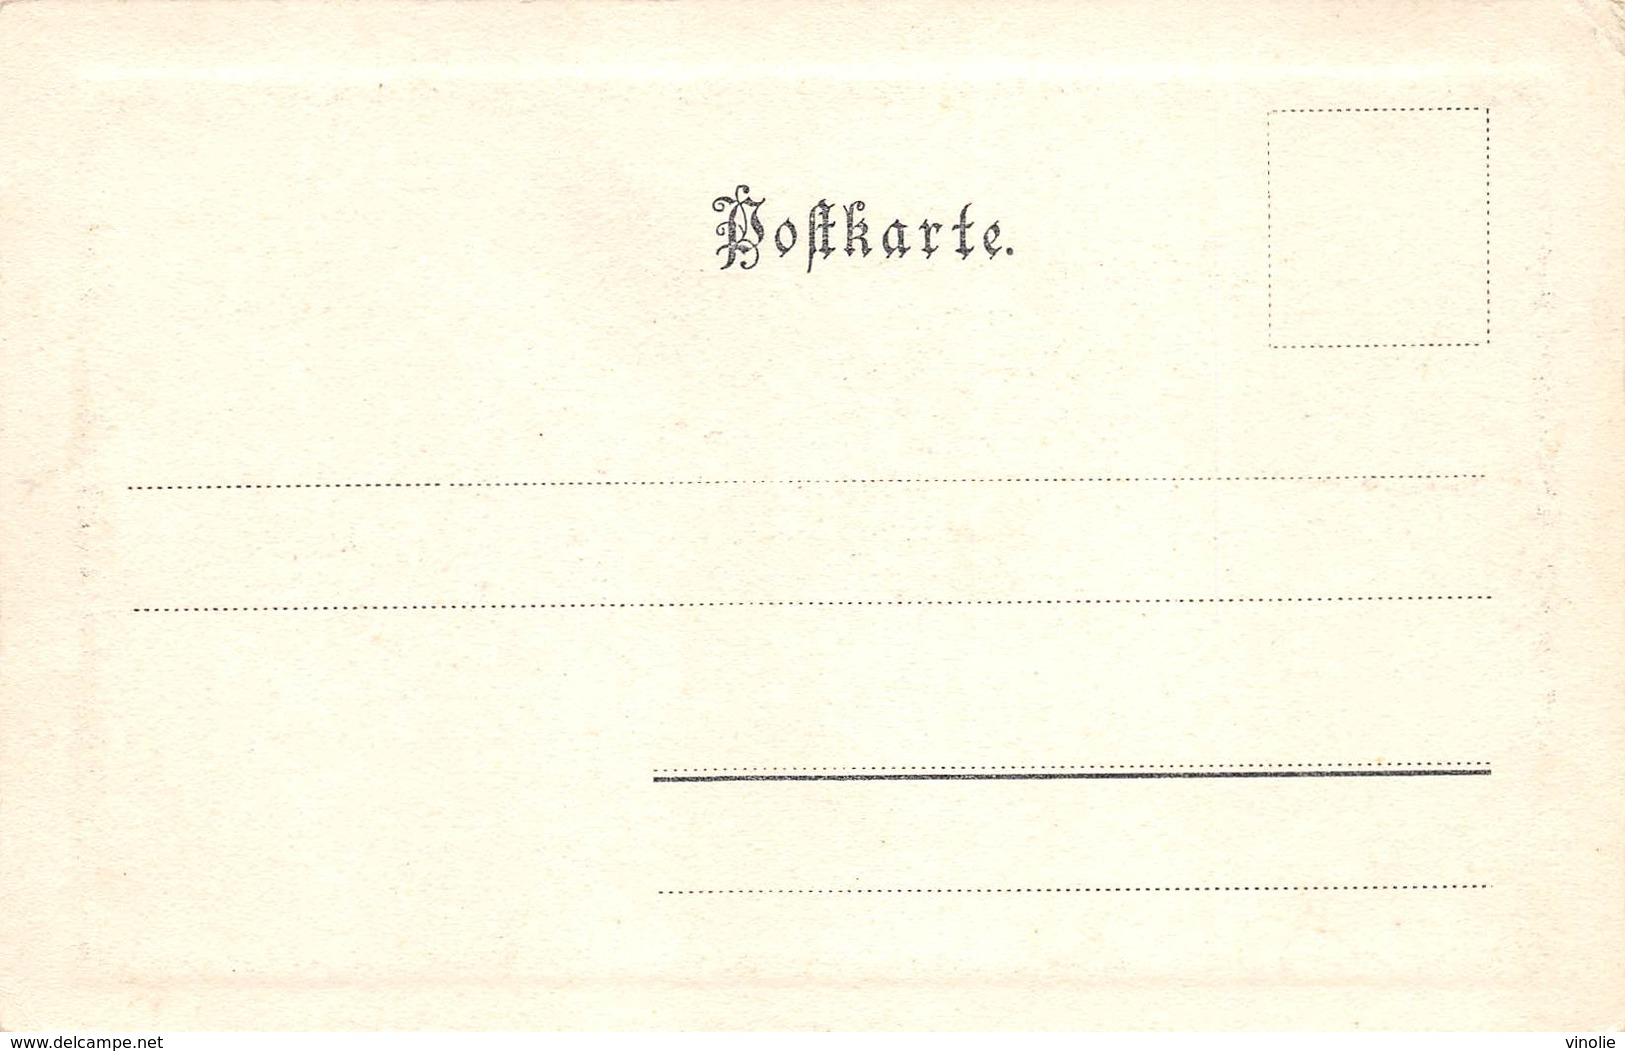 PIE-Arg-18-6543 : KÖNIGSWINTER U. DRACHENFELS - Koenigswinter